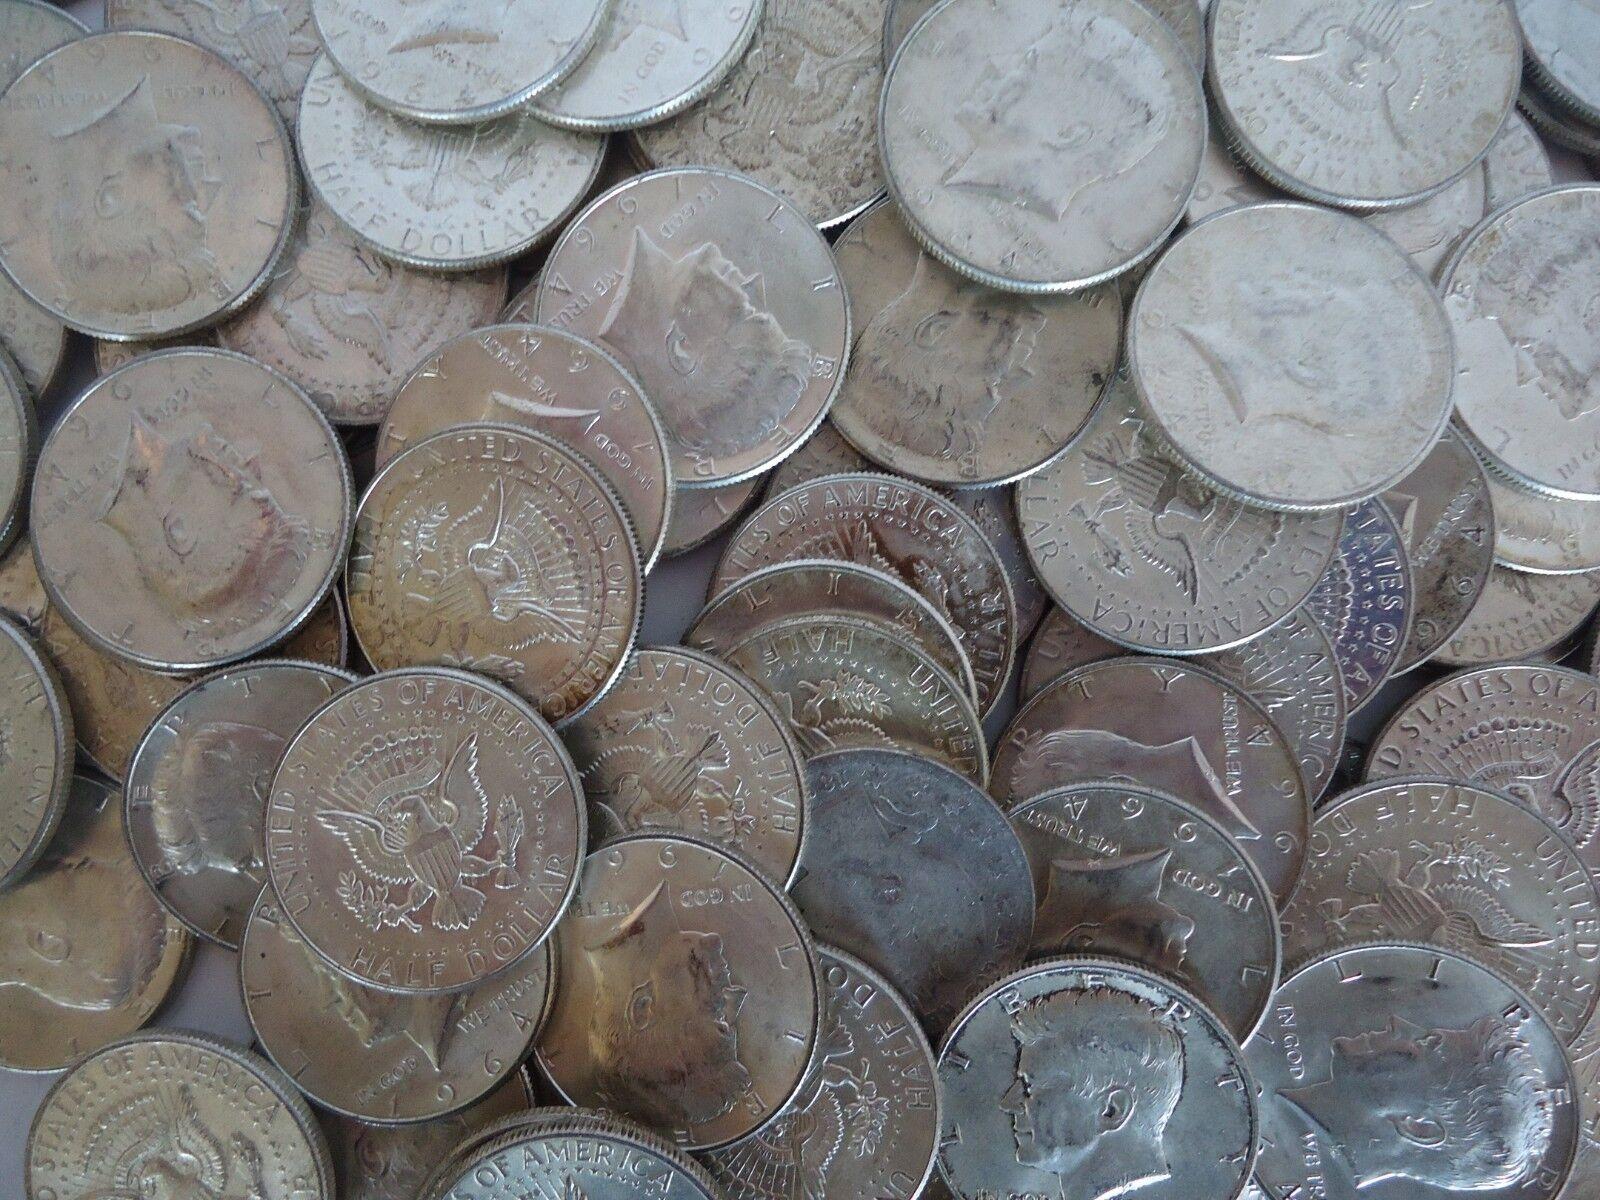 1964 Kennedy Half Dollars, Roll of 20, 90% Silver, Circulated